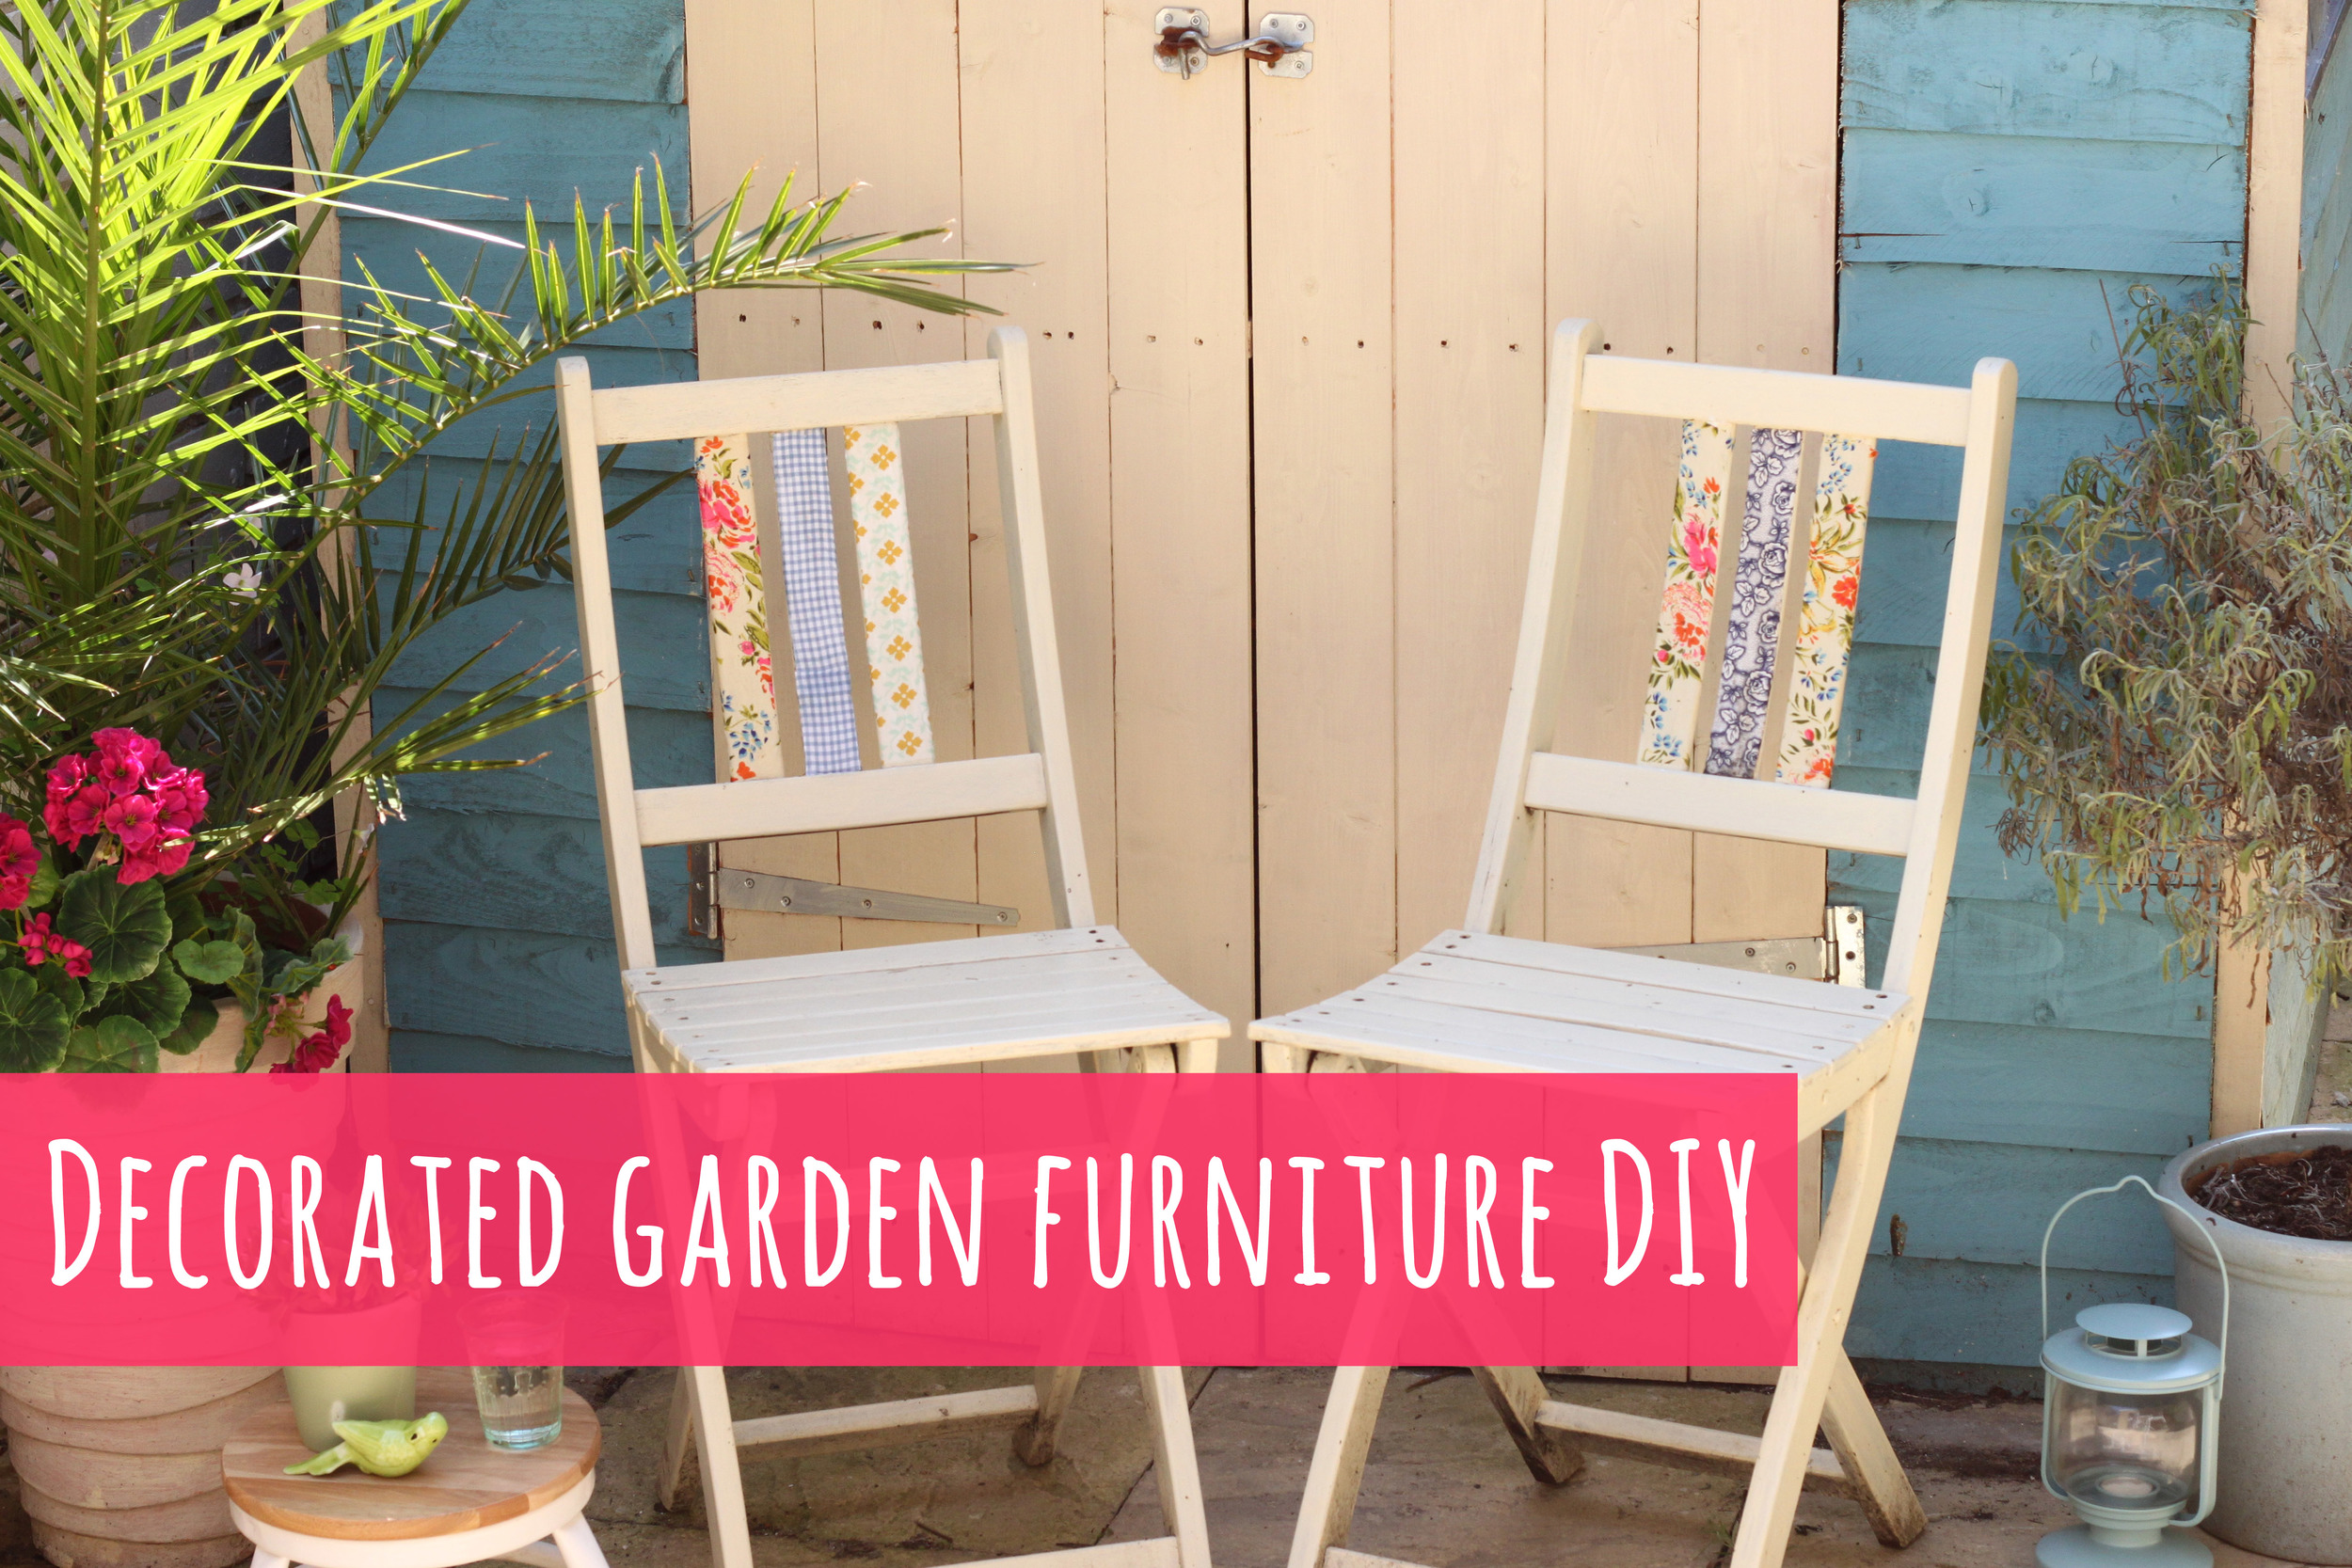 garden chair tumbnail.jpg